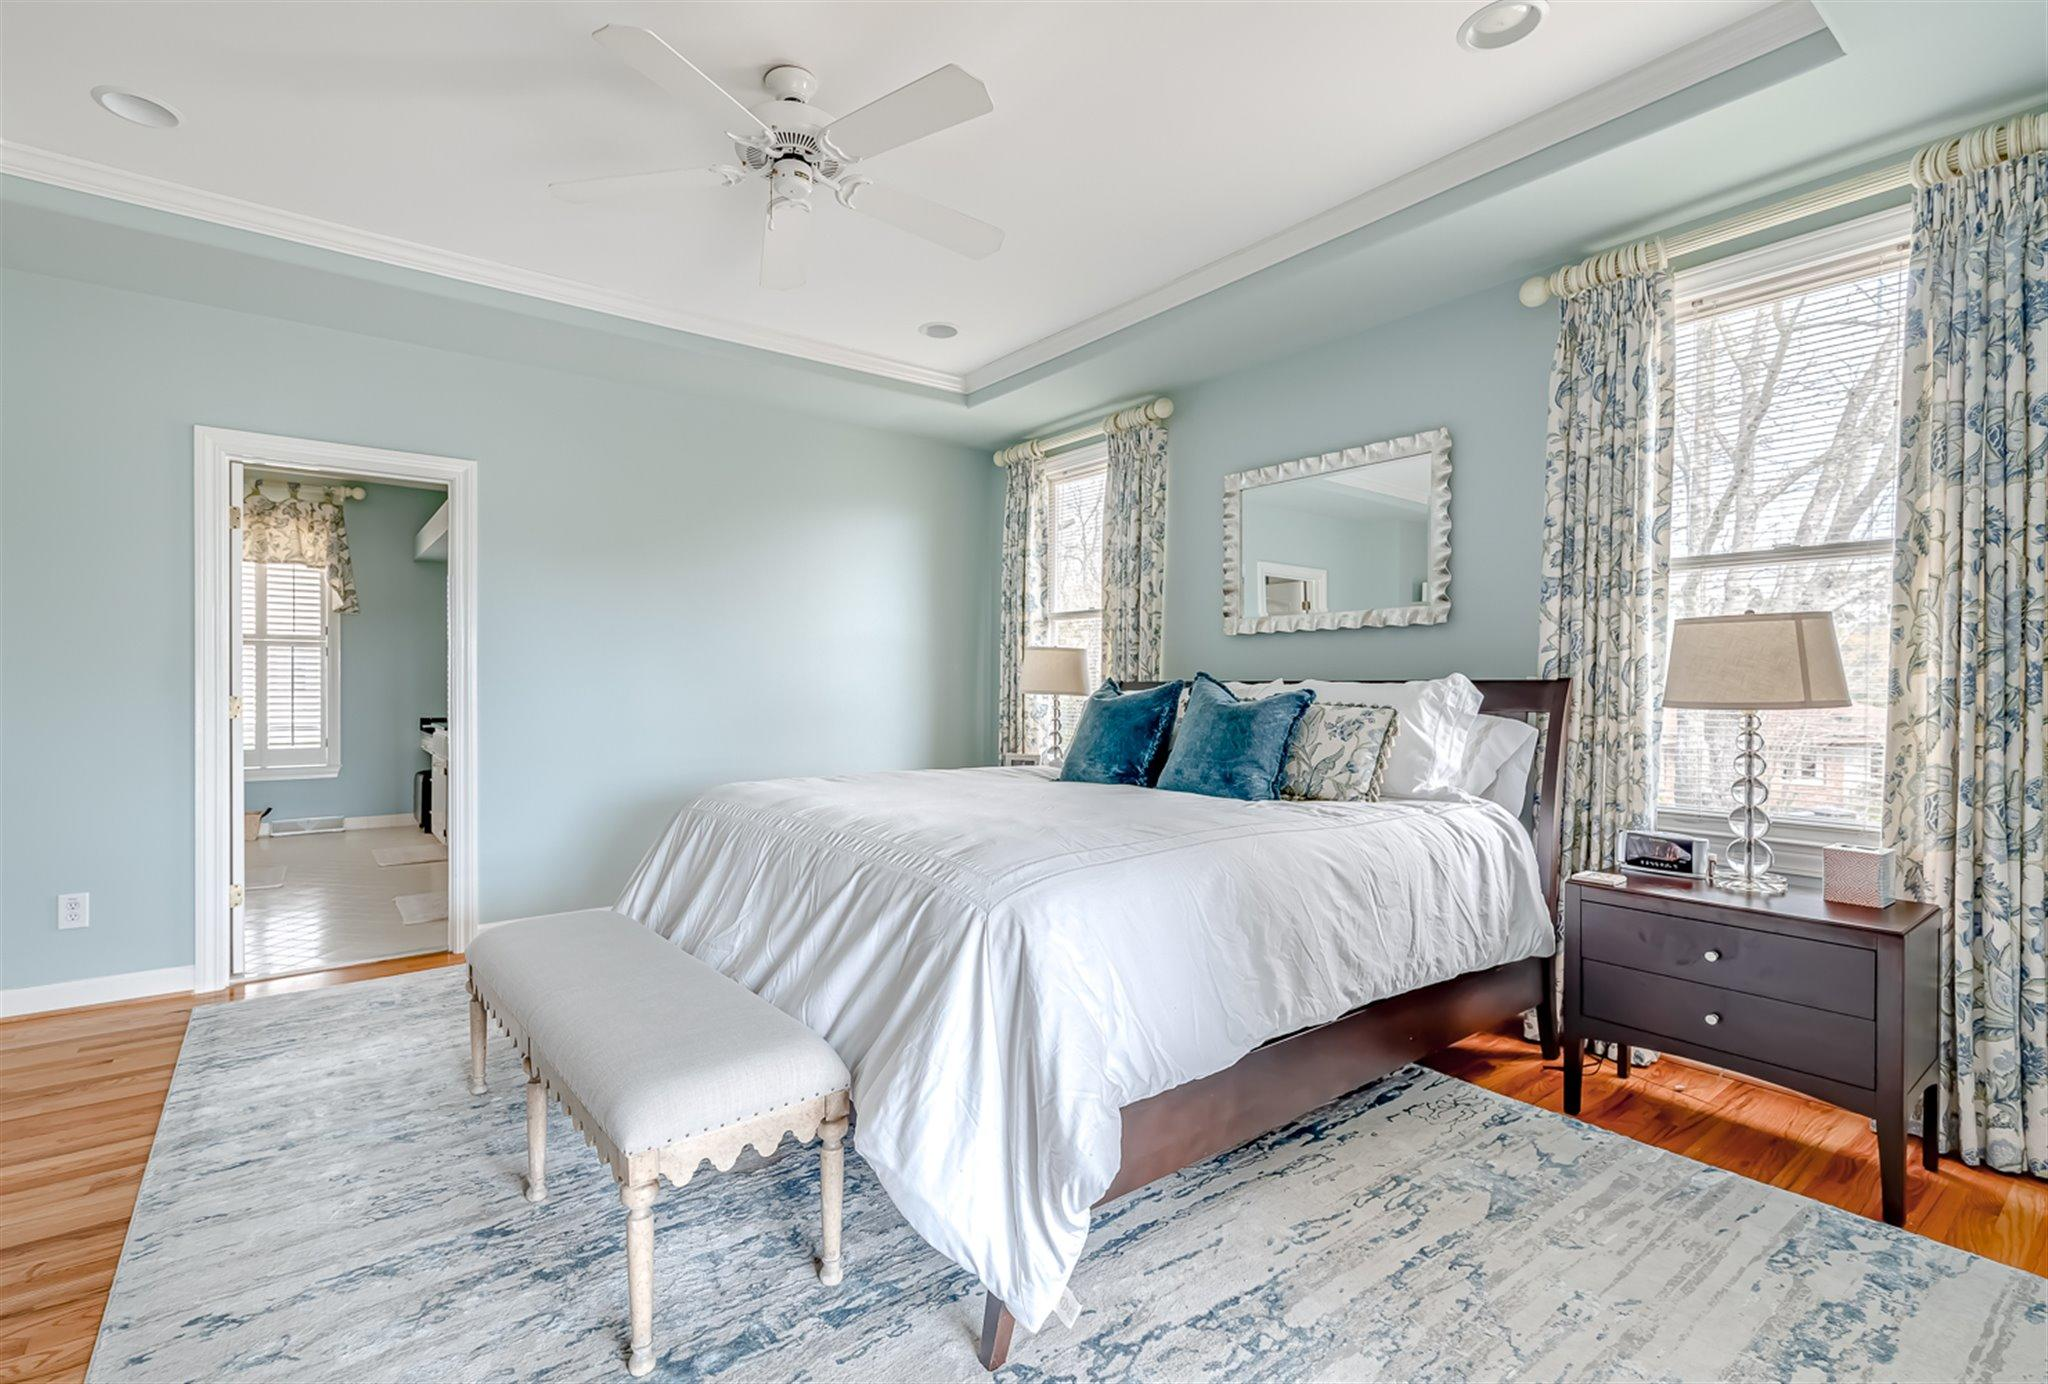 Indigo Point Homes For Sale - 50 Indigo Point, Charleston, SC - 26